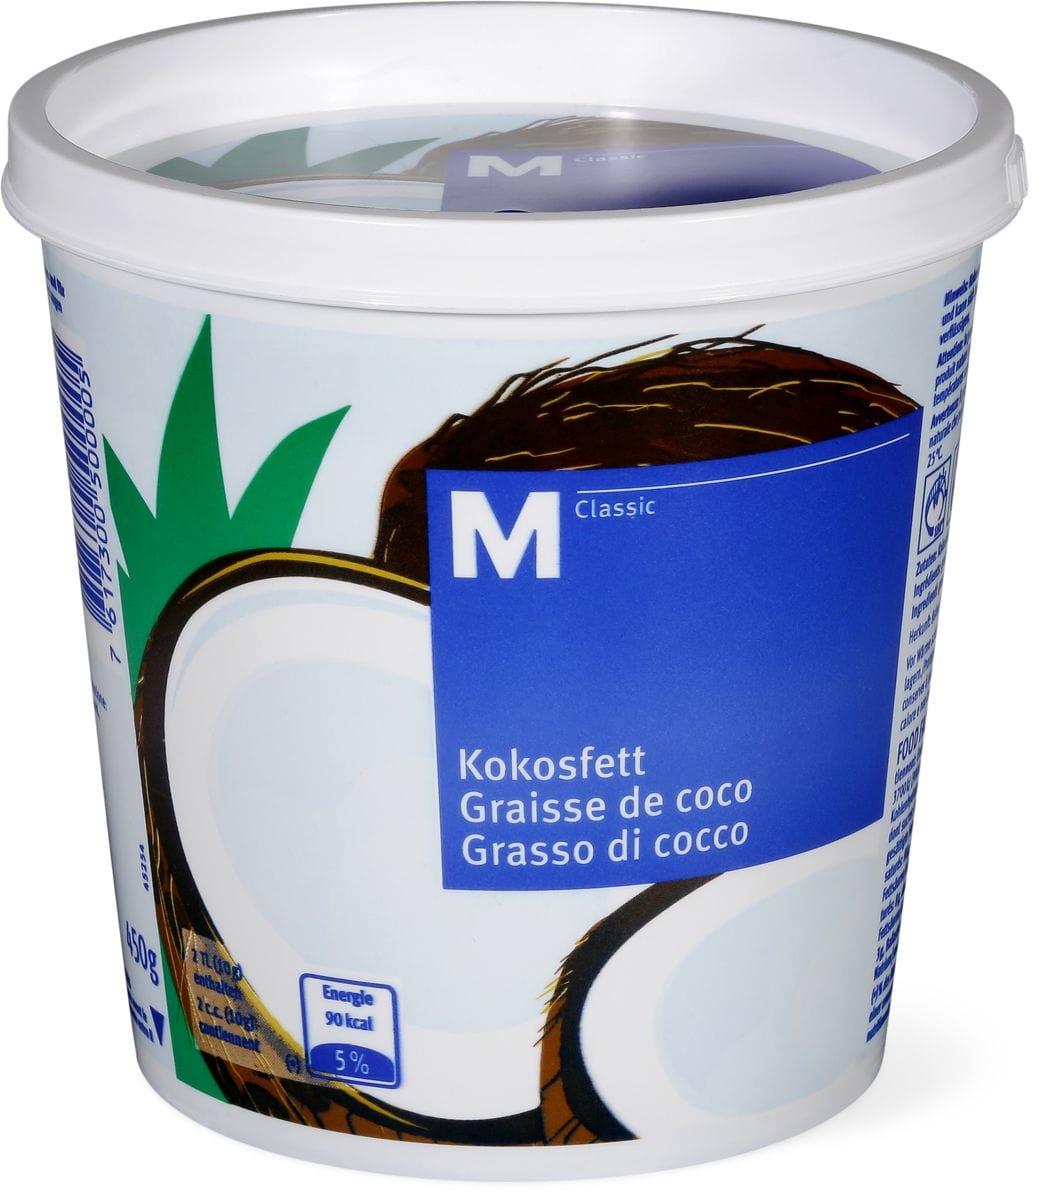 M-Classic Graisse de coco